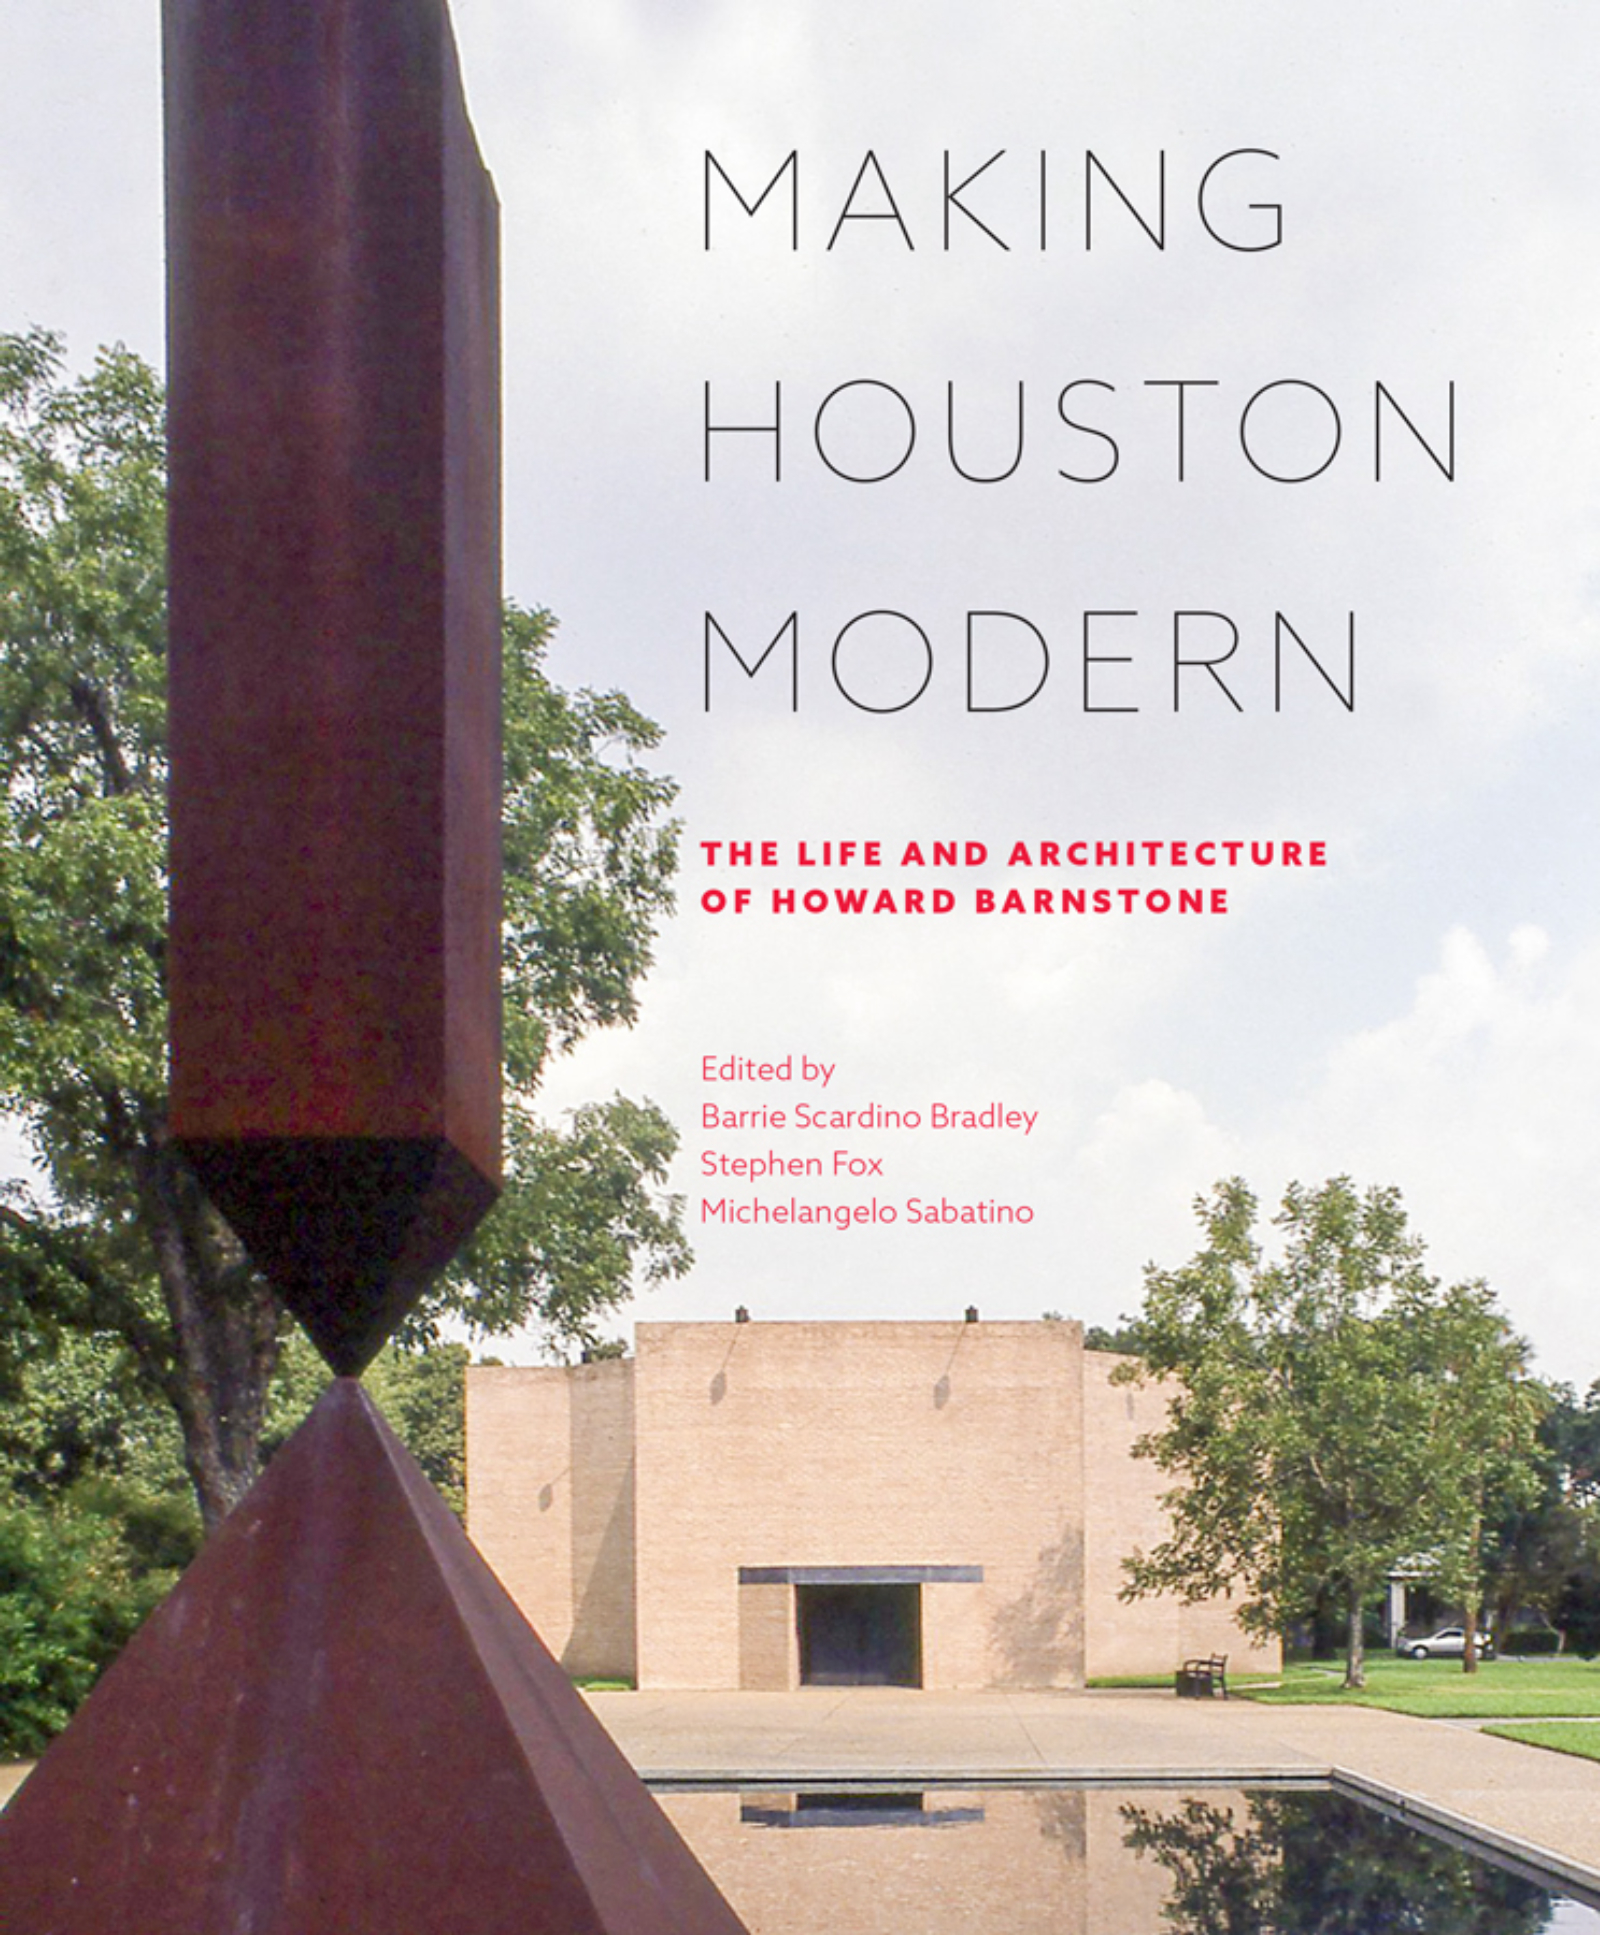 making houston modern book cover